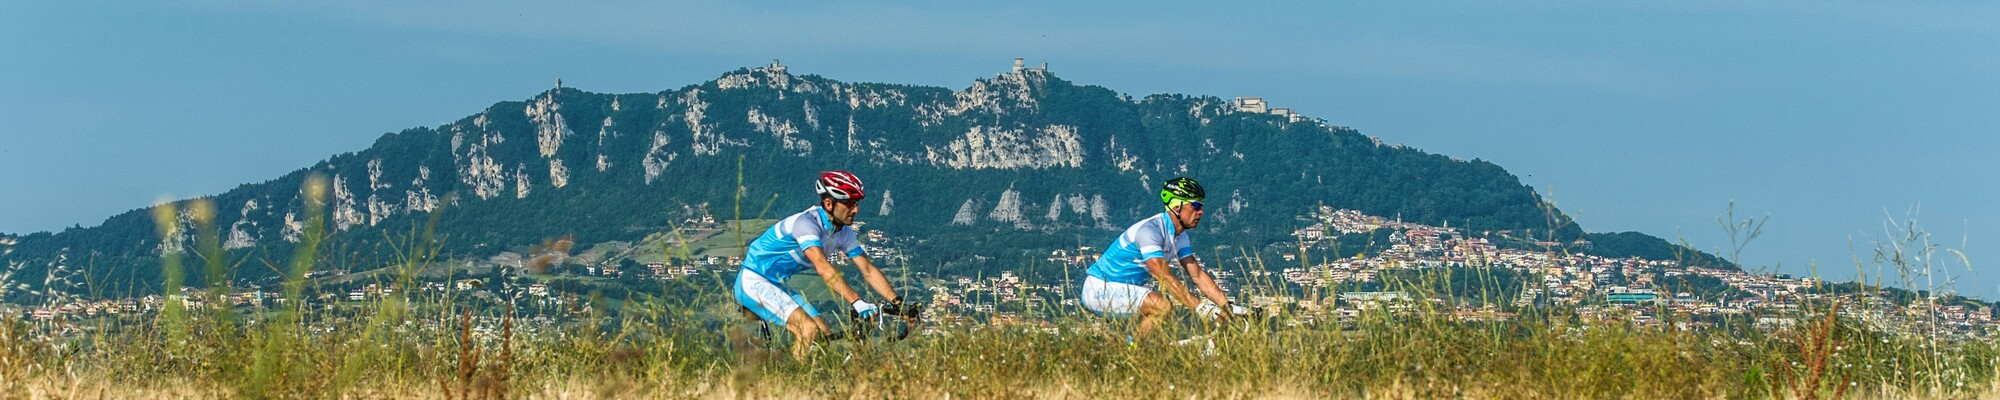 ciclisti a San Marino